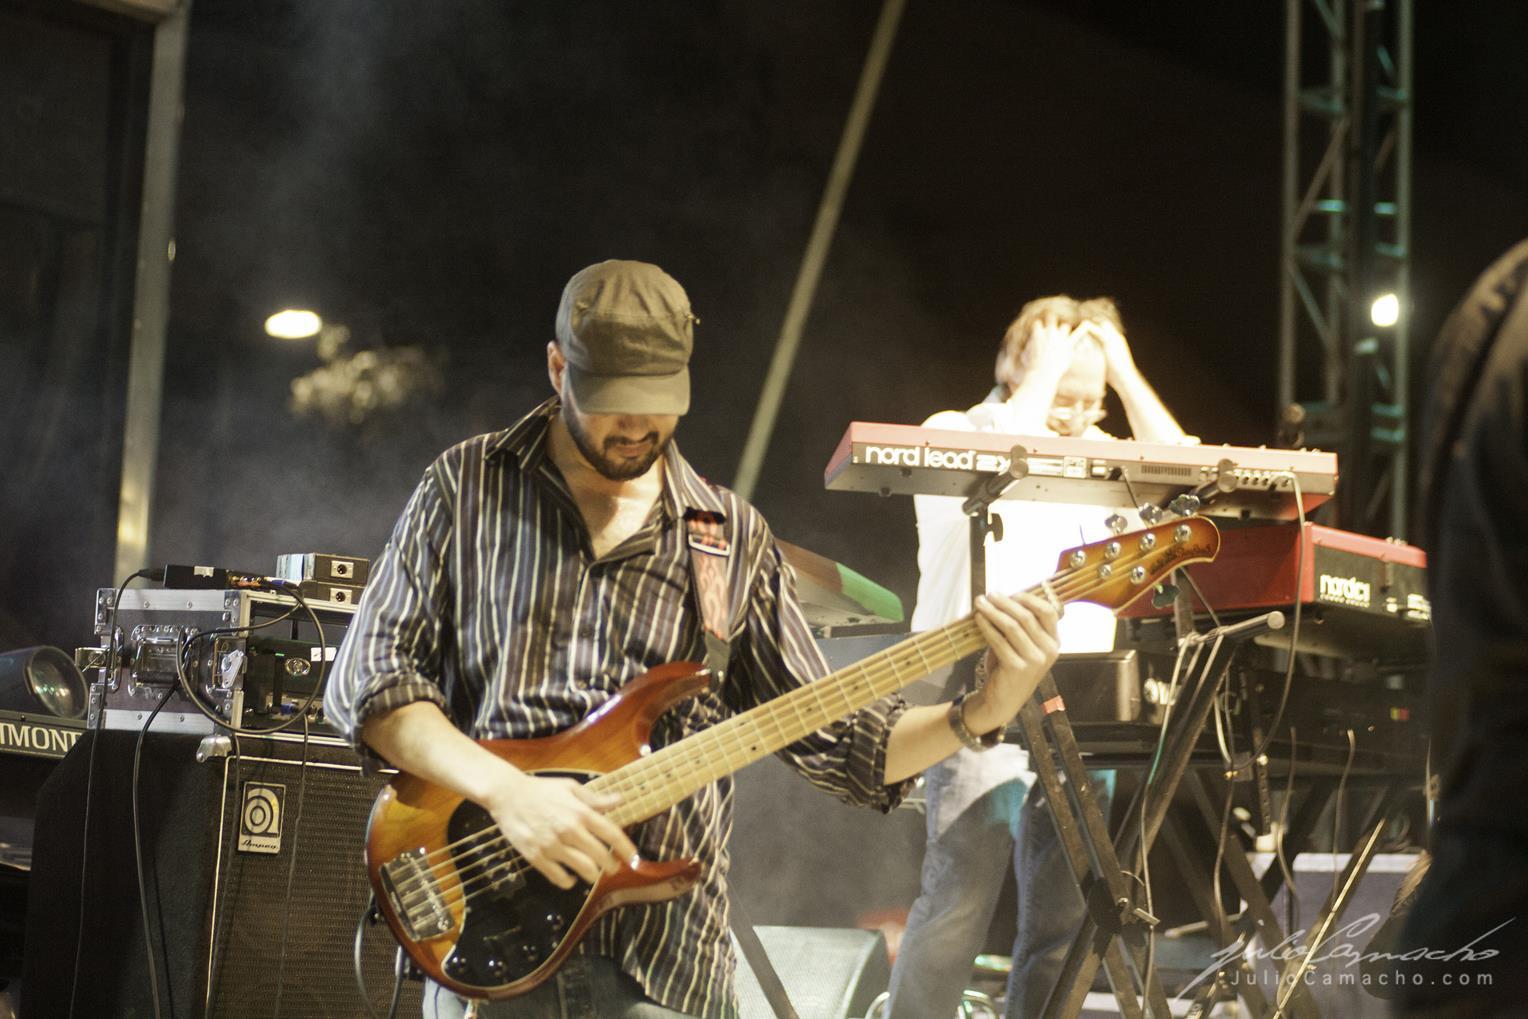 2014-10-30 31 CAST TOUR Ensenada y Tijuana - 1610 - www.Juli (Copy).jpg